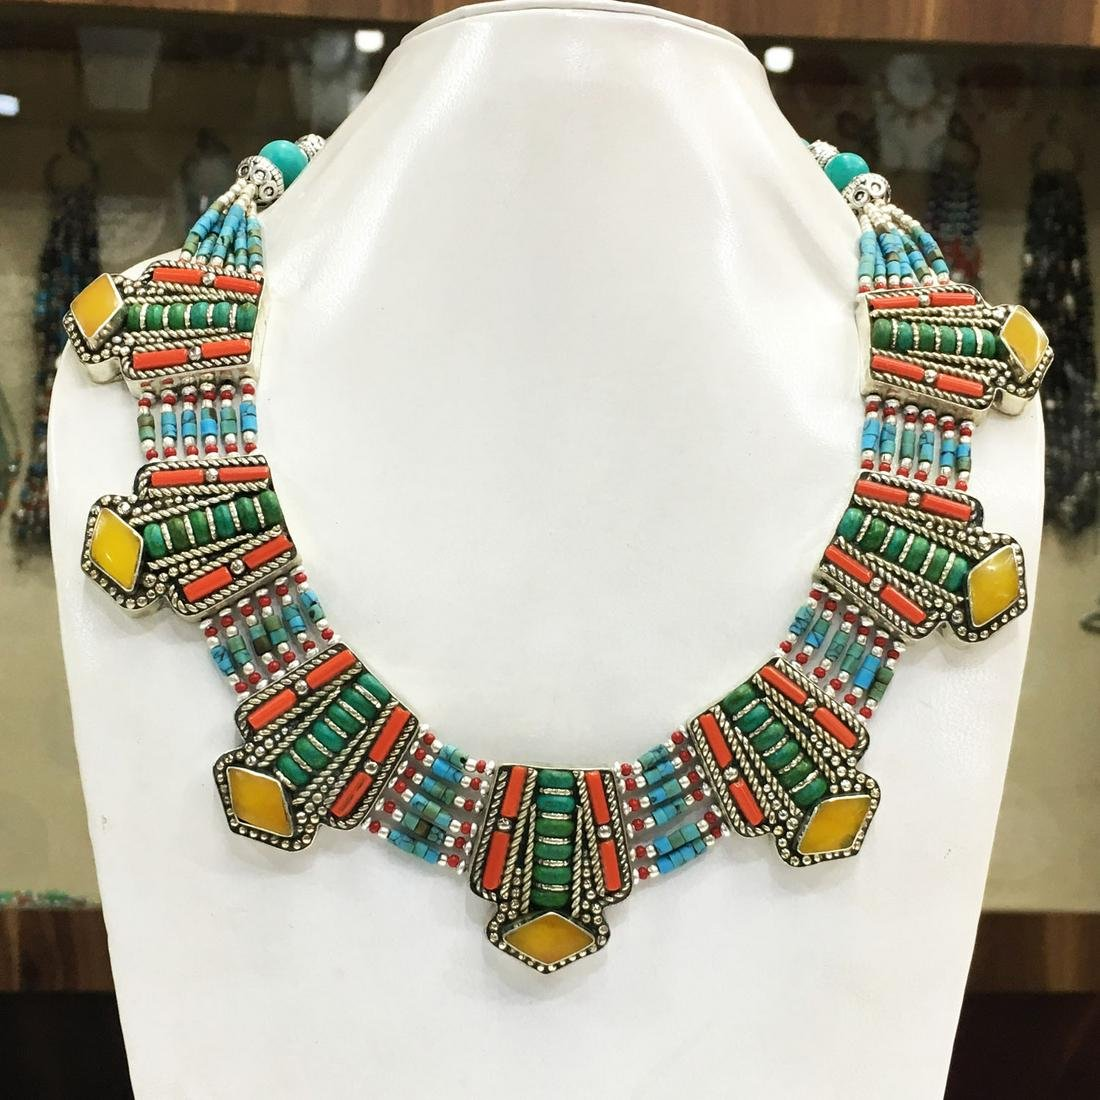 Tibetan Natural Turquoise & Amber Handmade Necklace